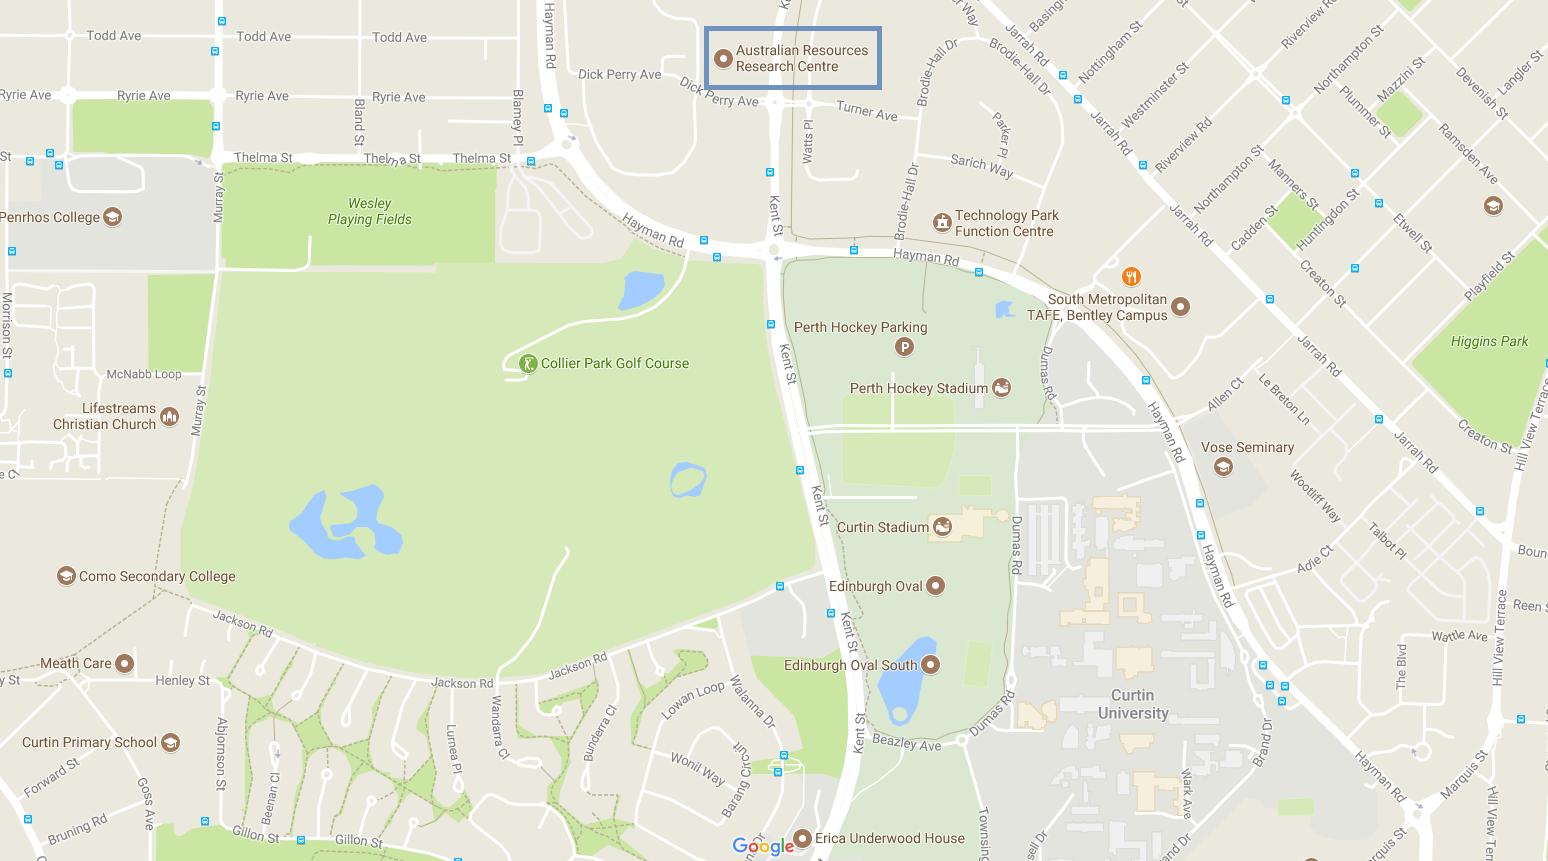 ARRC Location